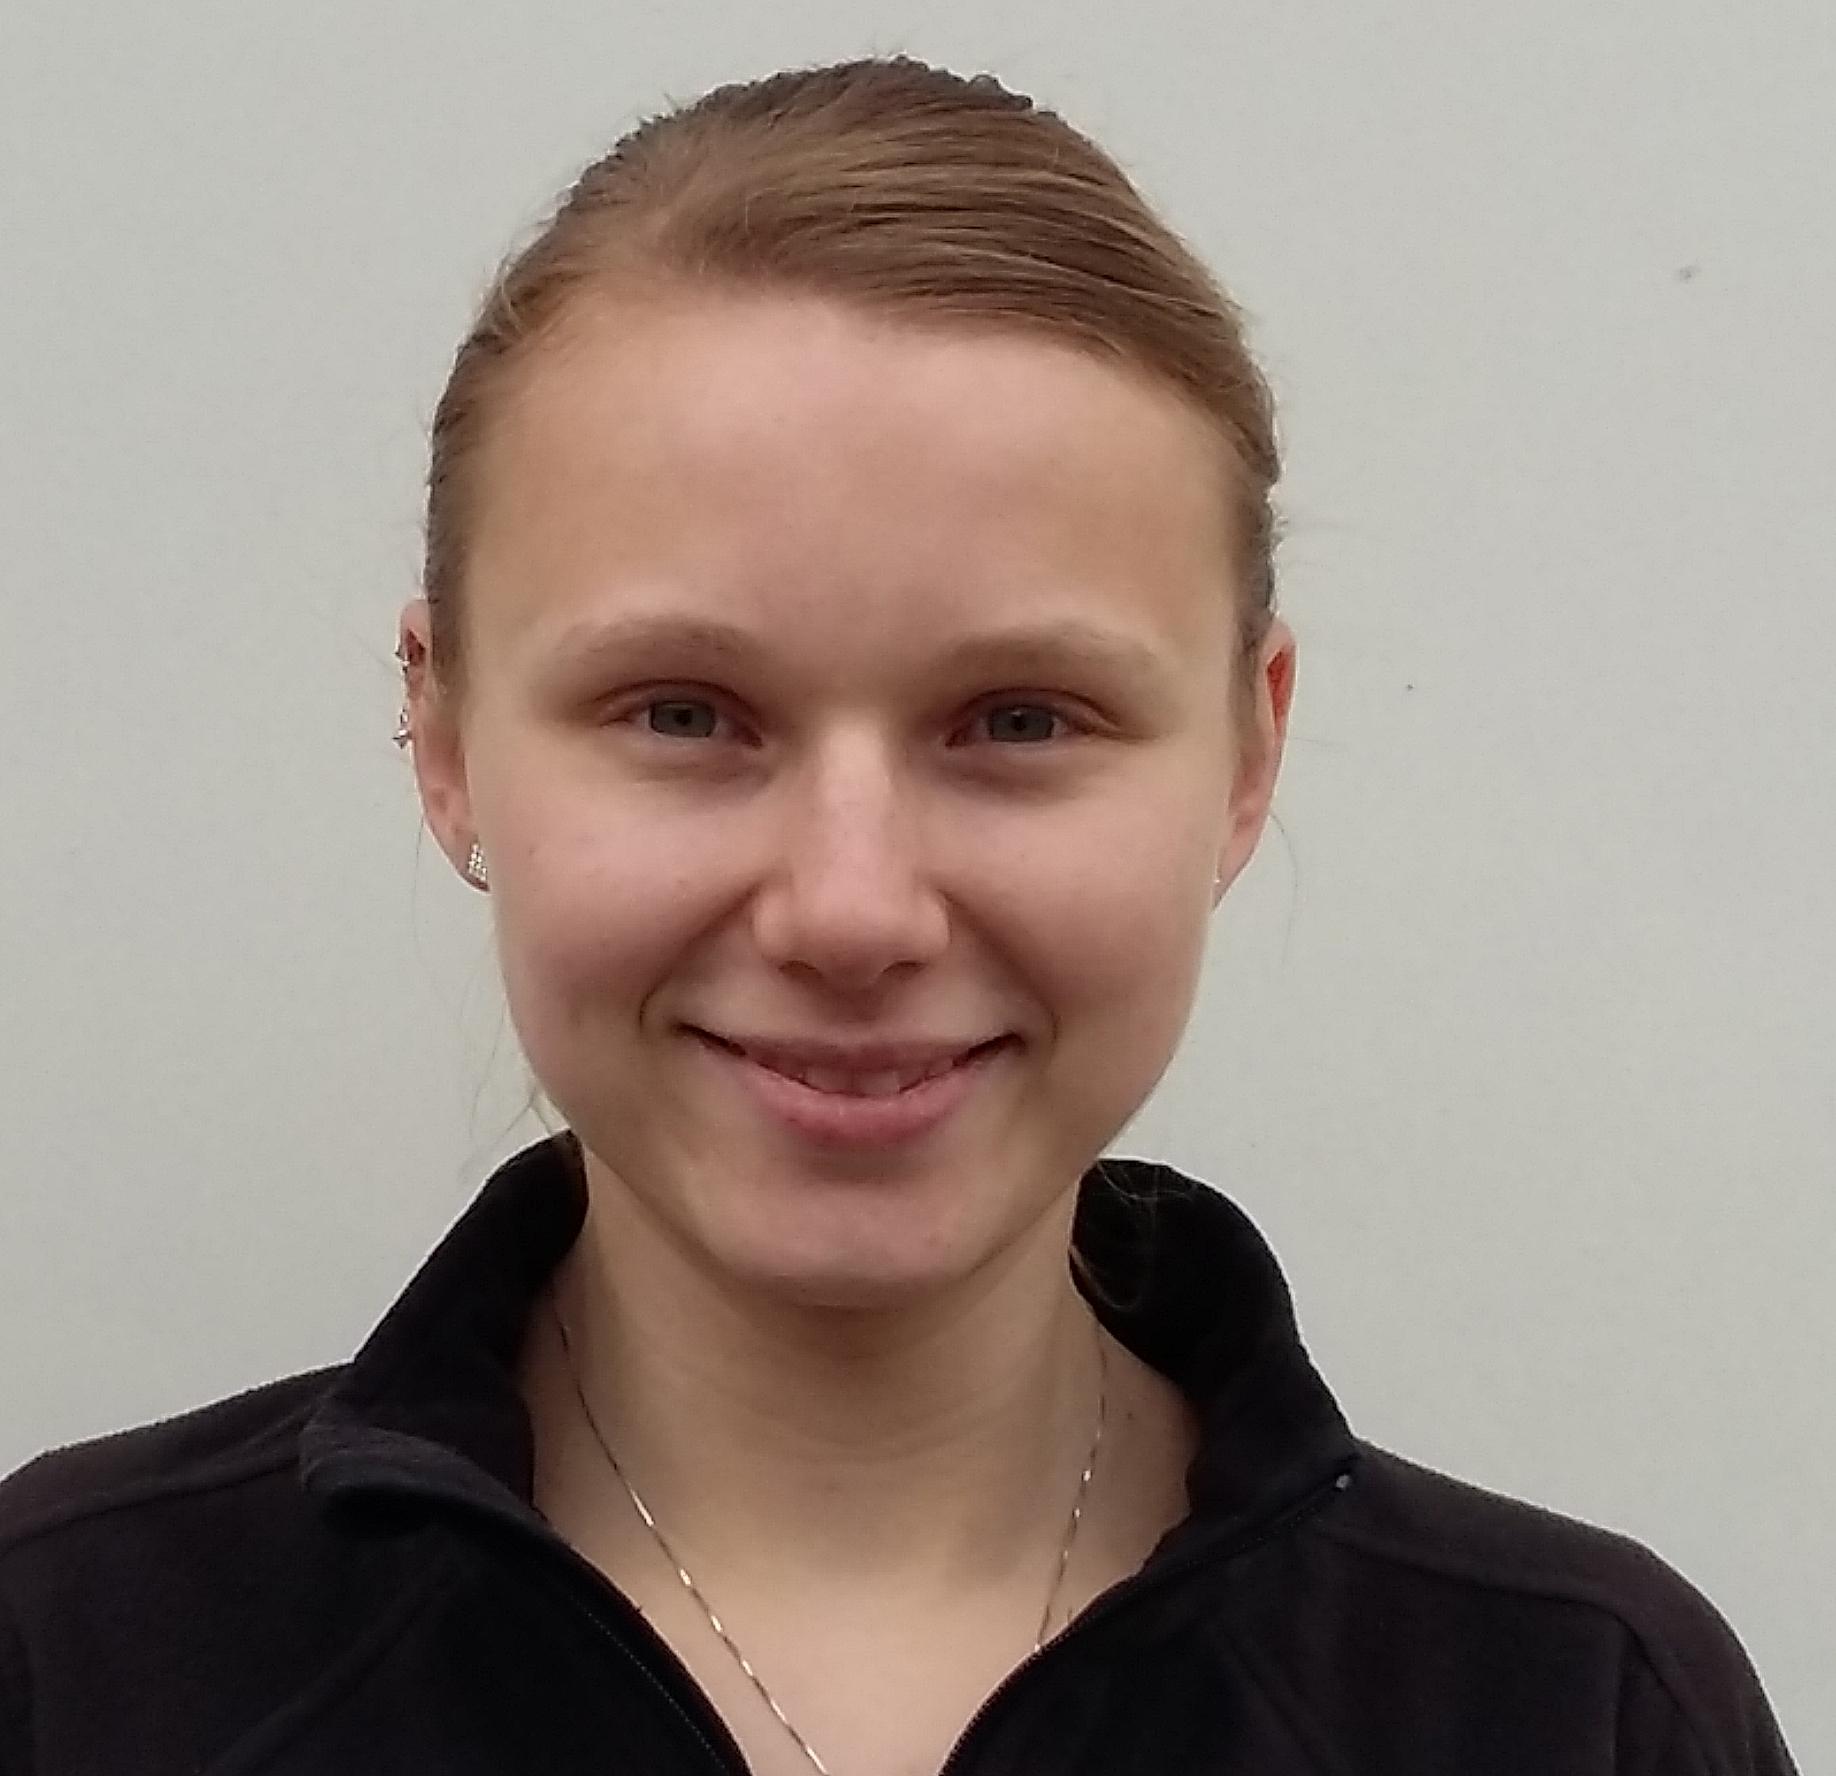 Franziska Scheuringer